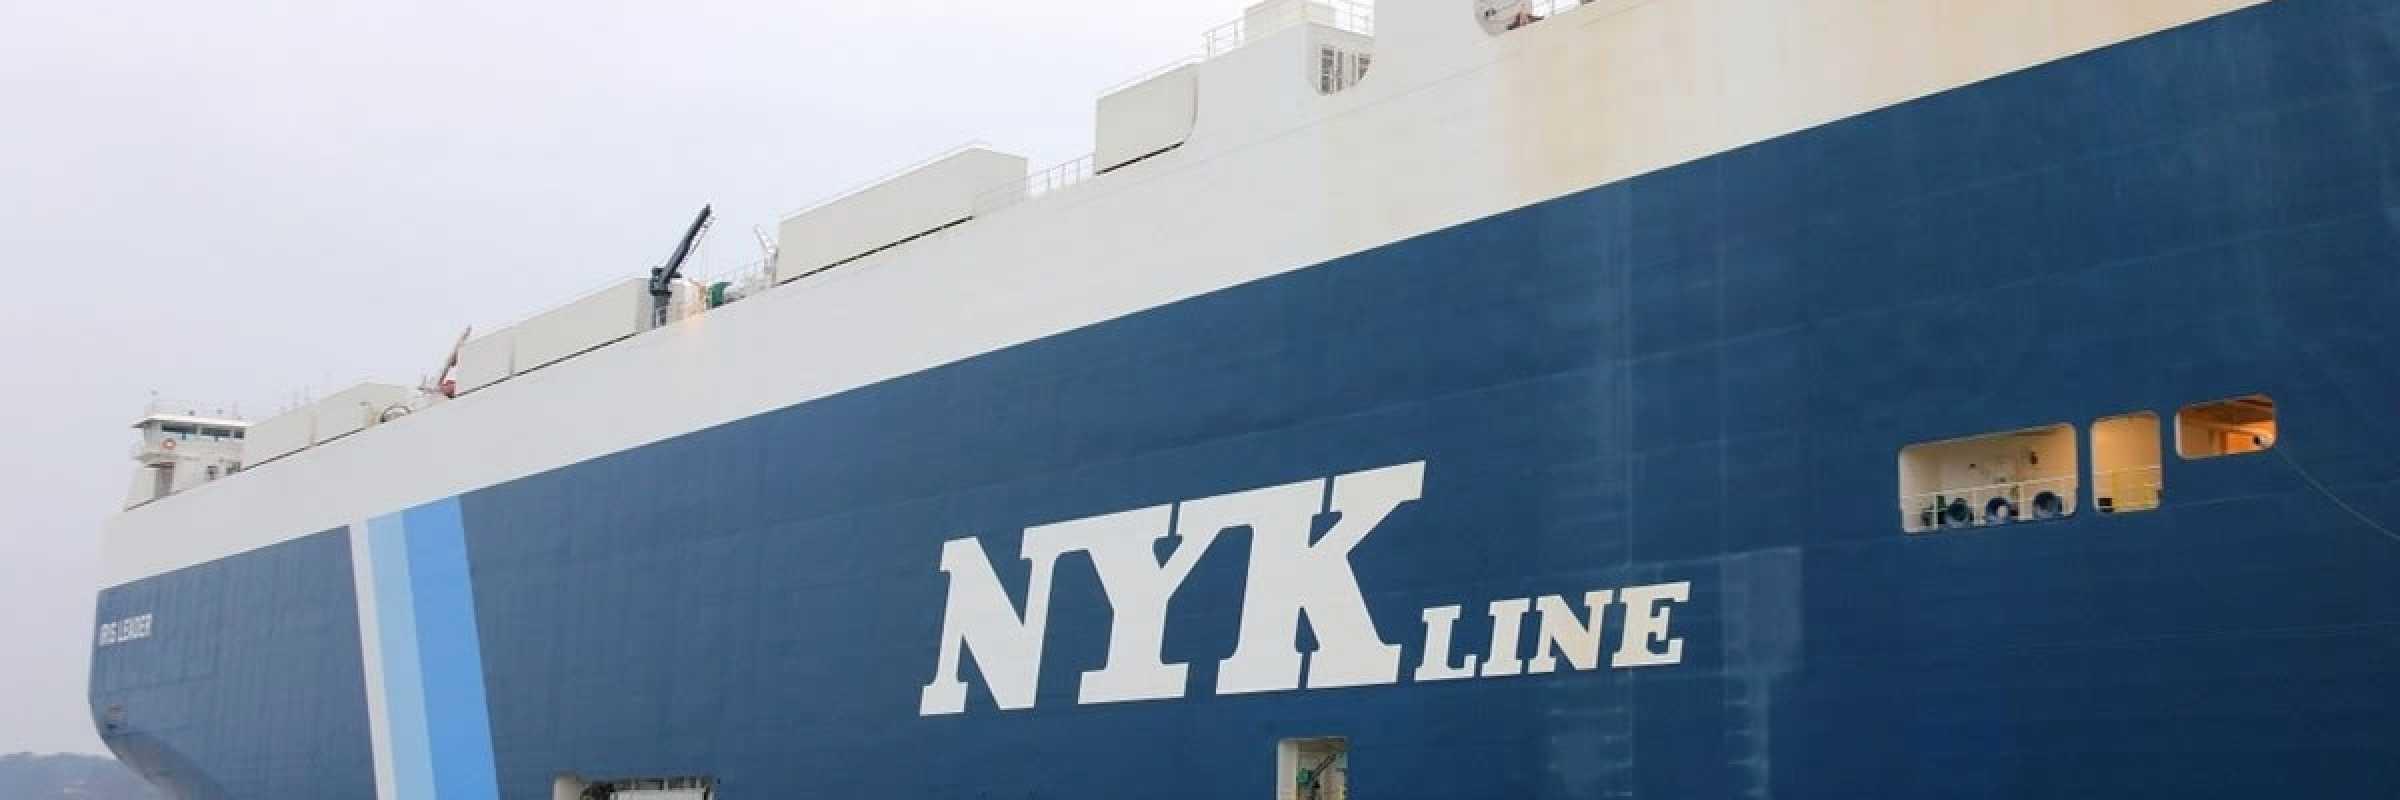 Japanese autonomous ship project gets AiP from ClassNK